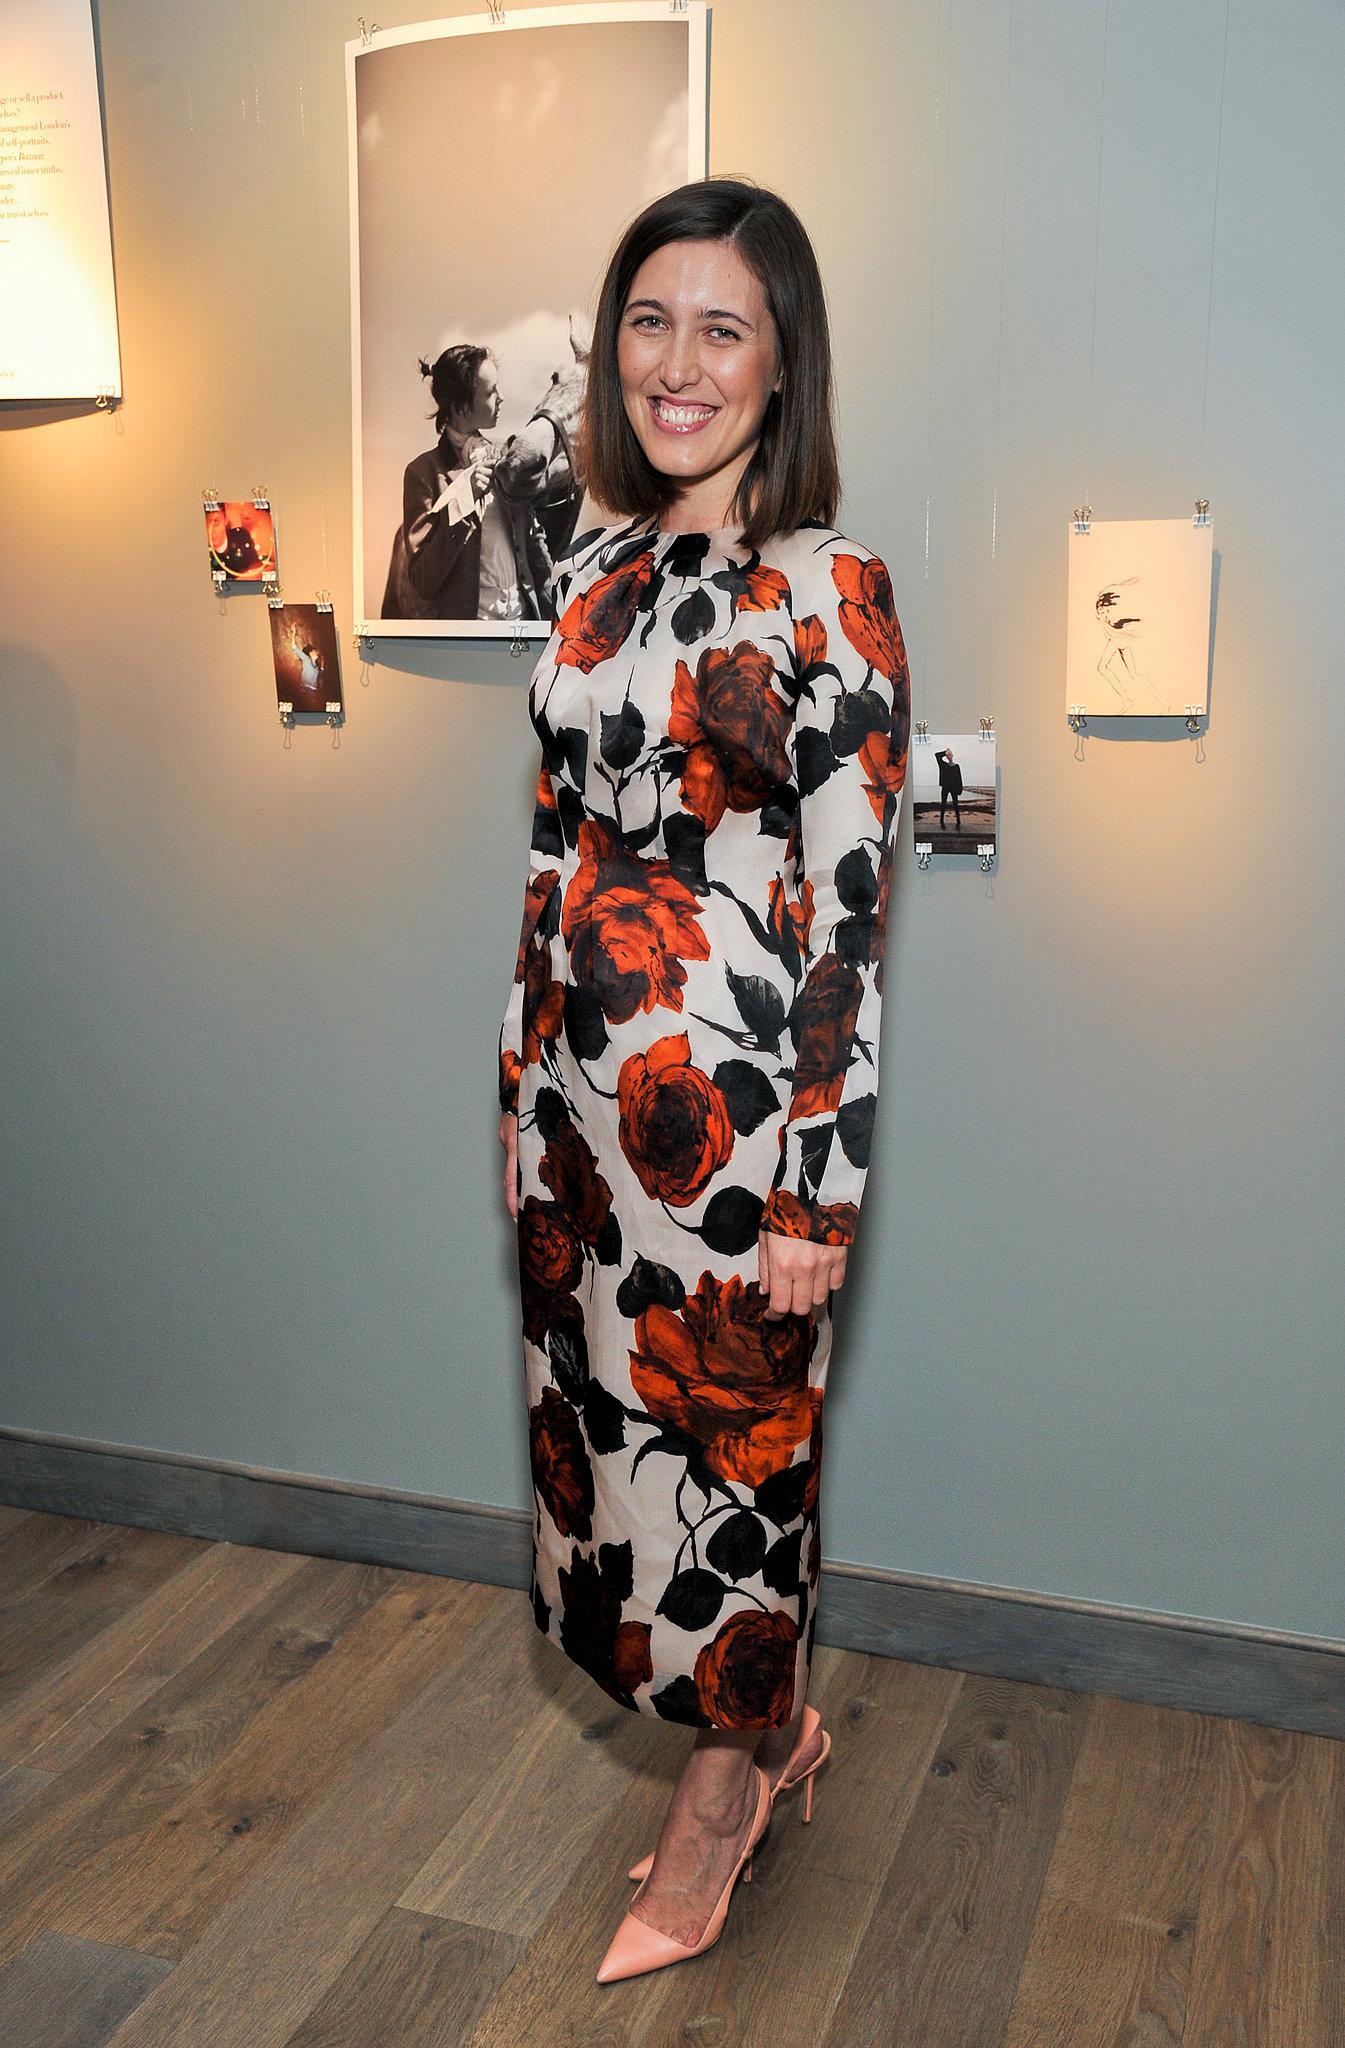 Emilia Wickstead showed her flower power at the Harper's Bazaar event at Moretti Fine Art.